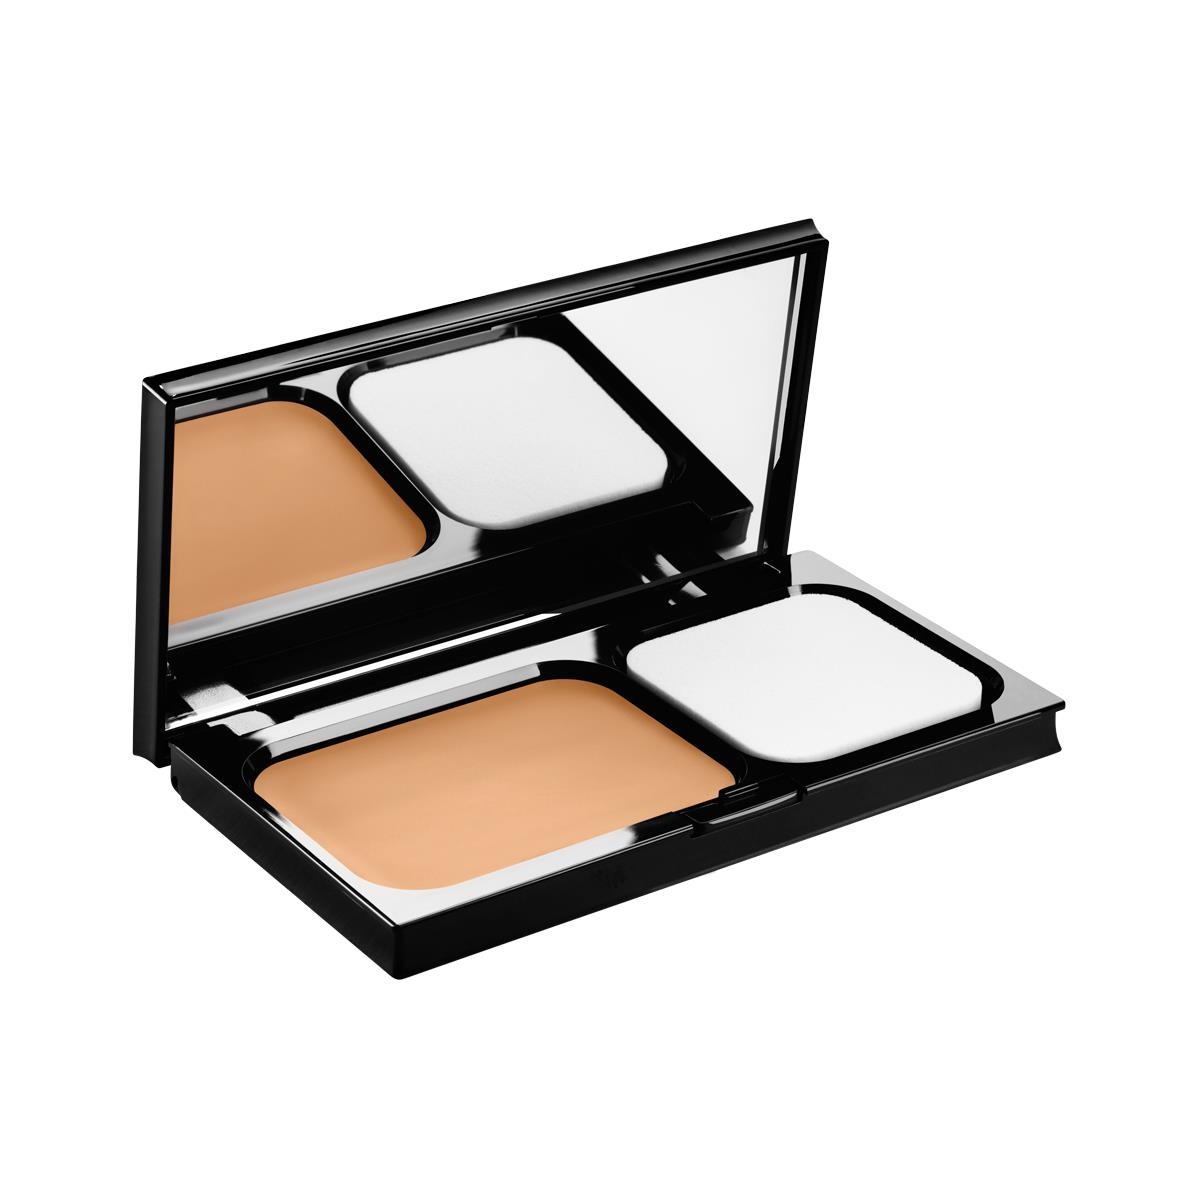 Base De Maquillaje Compacto En Crema 12H 15 Opal 10 Gr